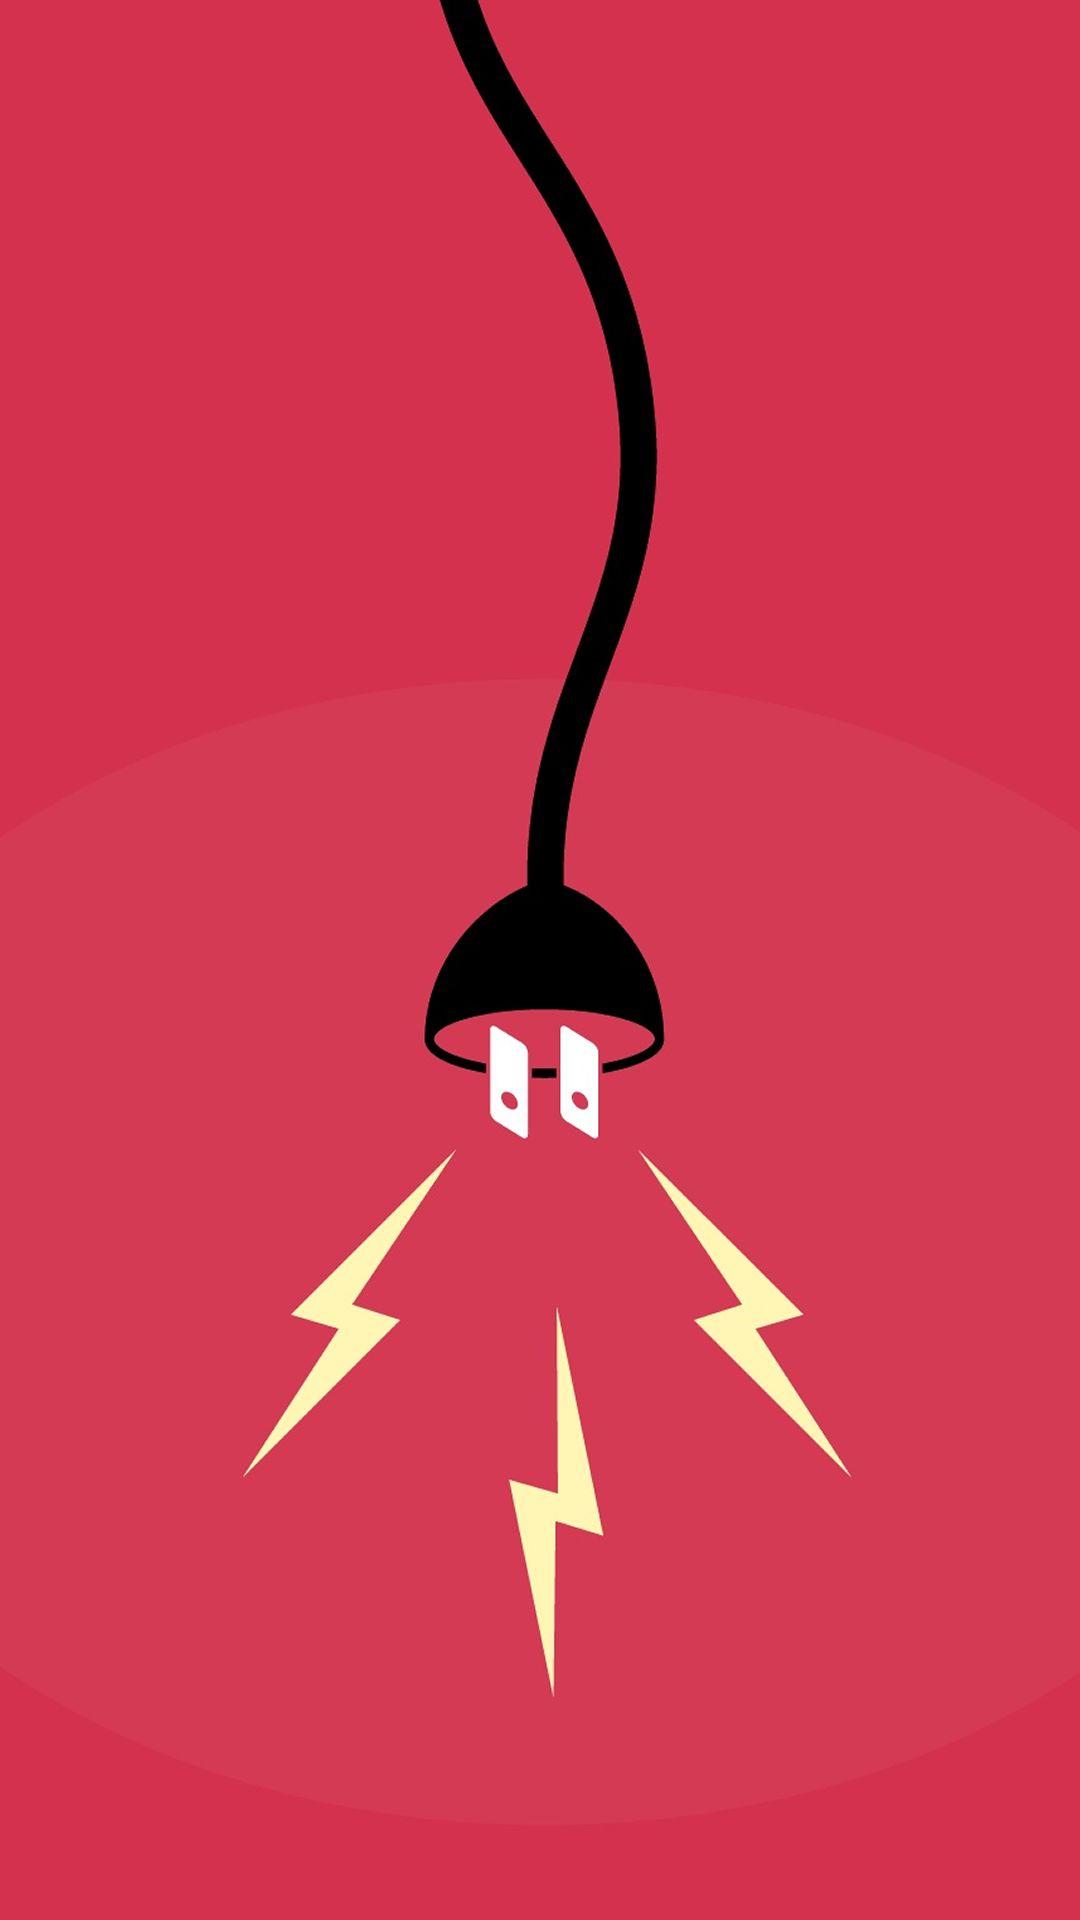 Wallpaper iphone tumblr boy - Sparkling Bulb Lamp Illust Art Iphone 6 Plus Wallpaper